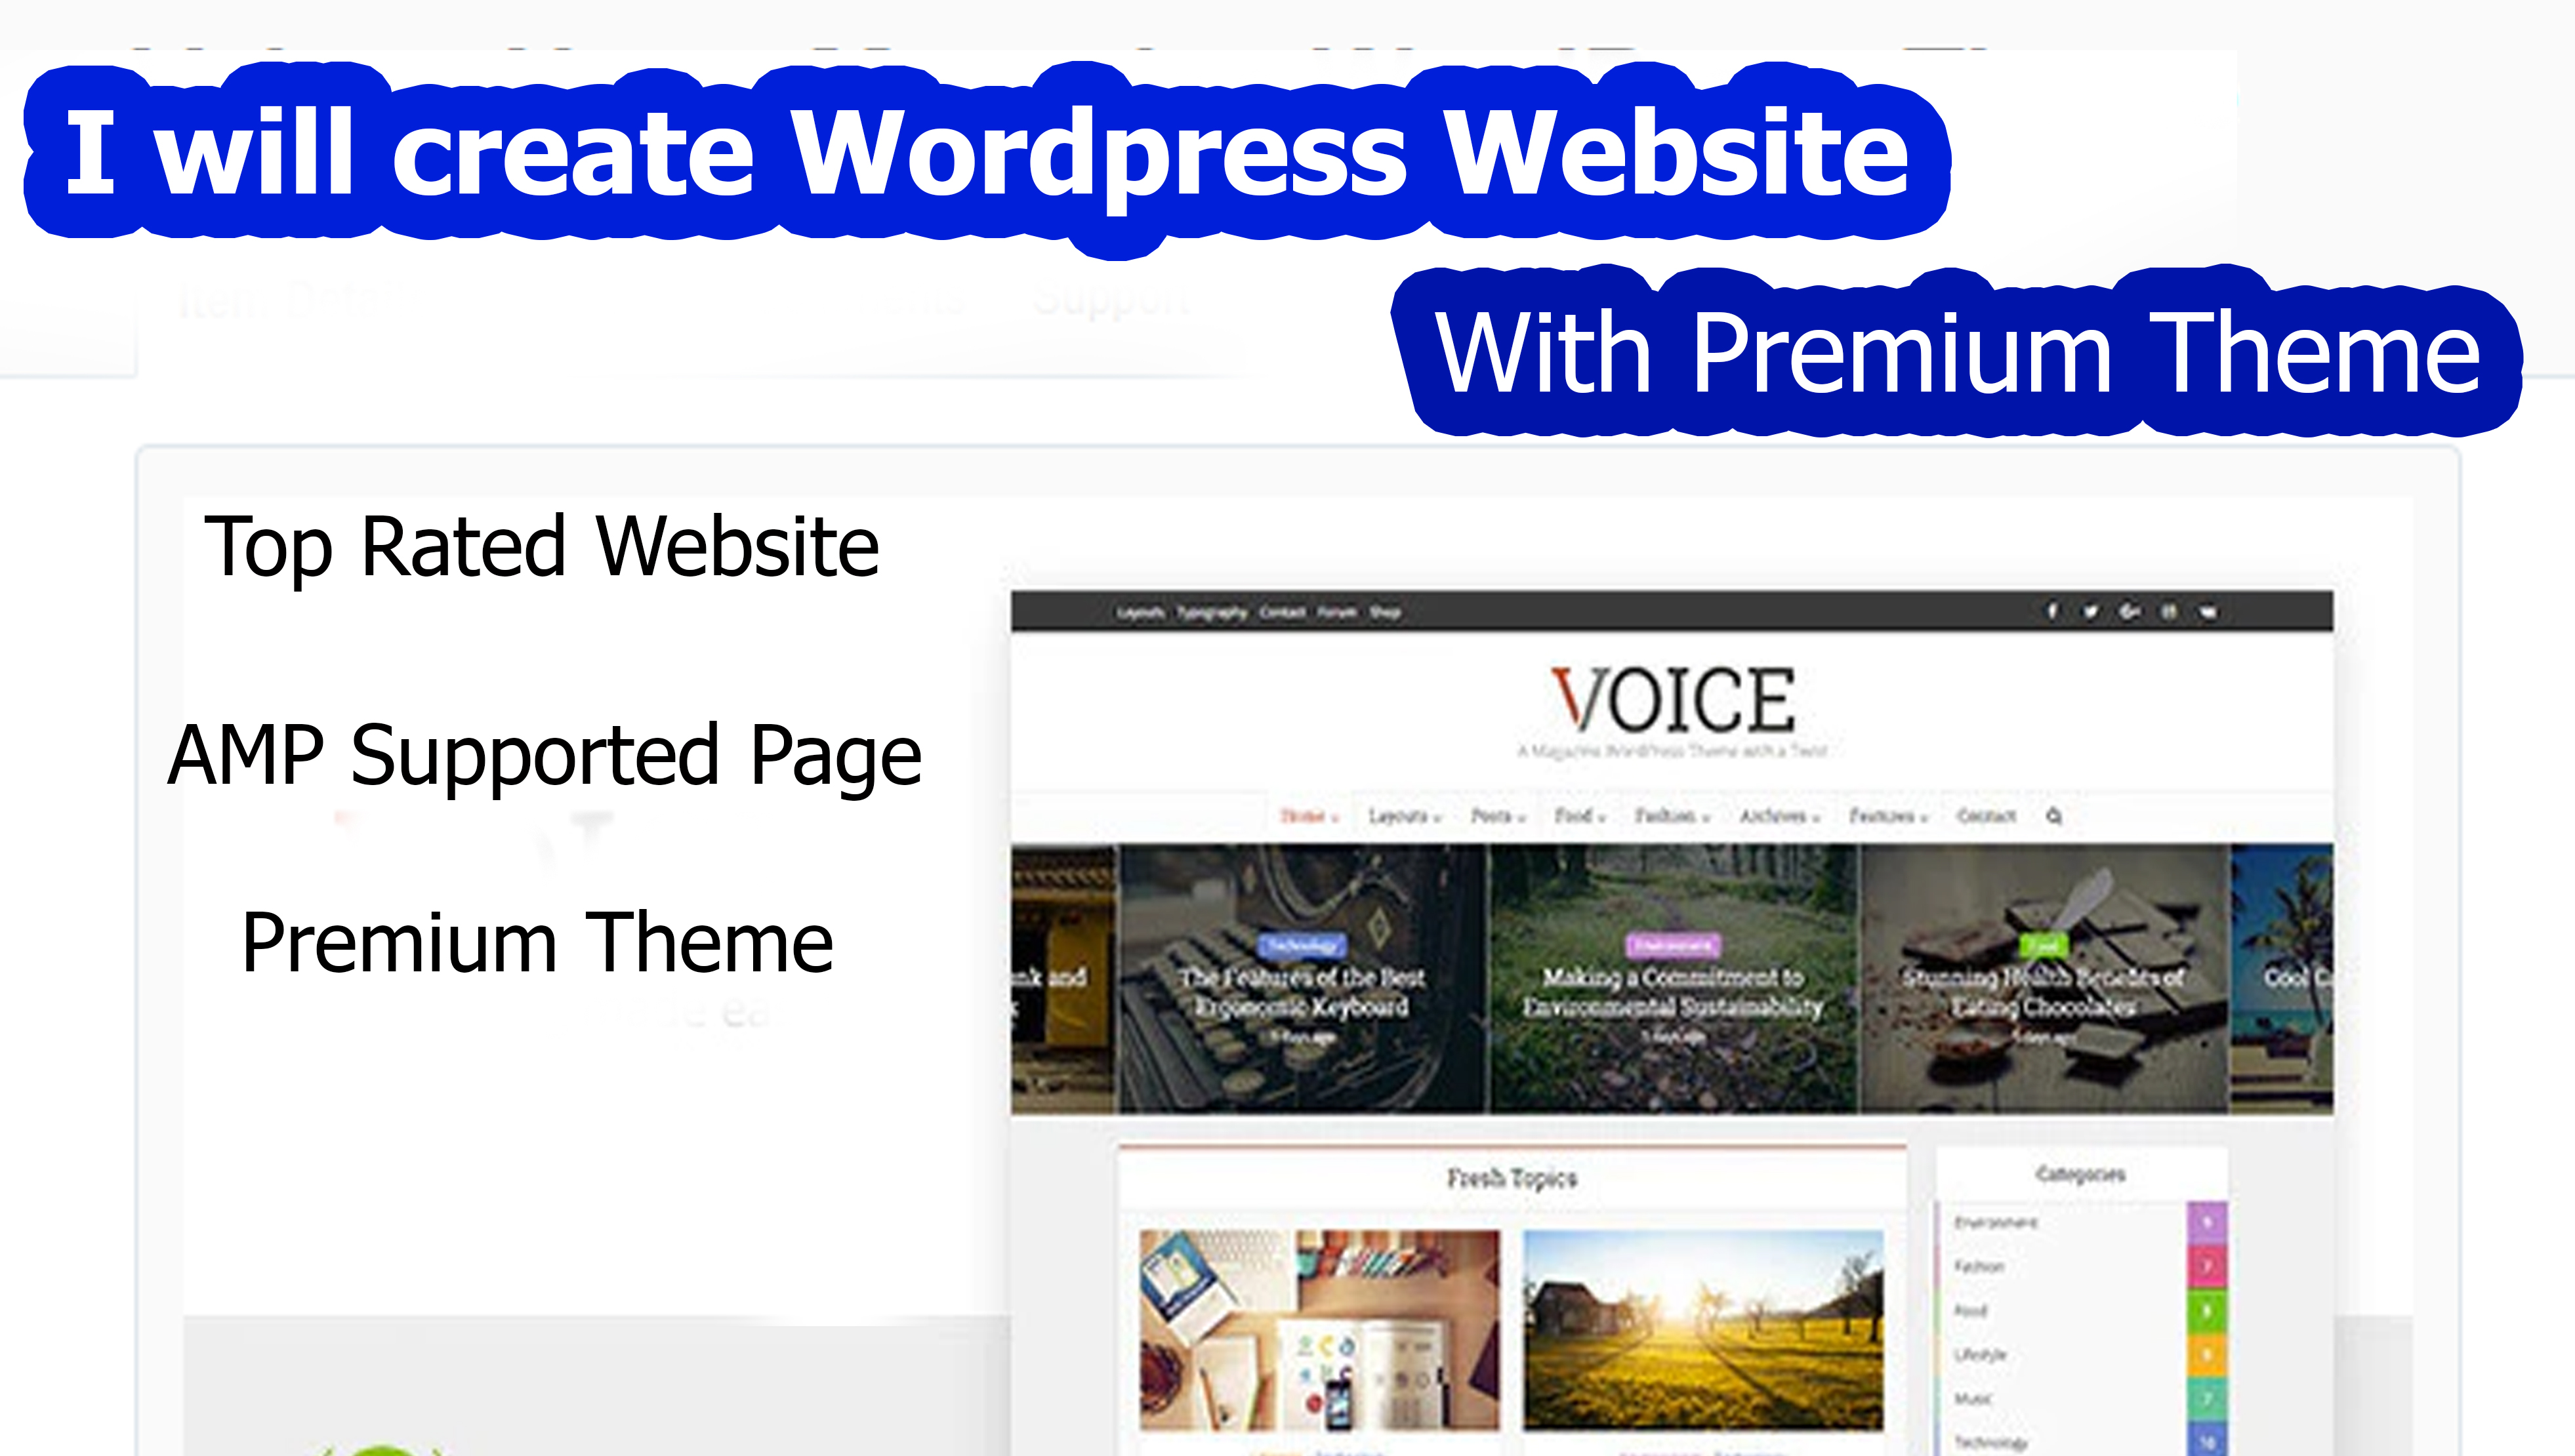 I will create wordpress website with premium theme